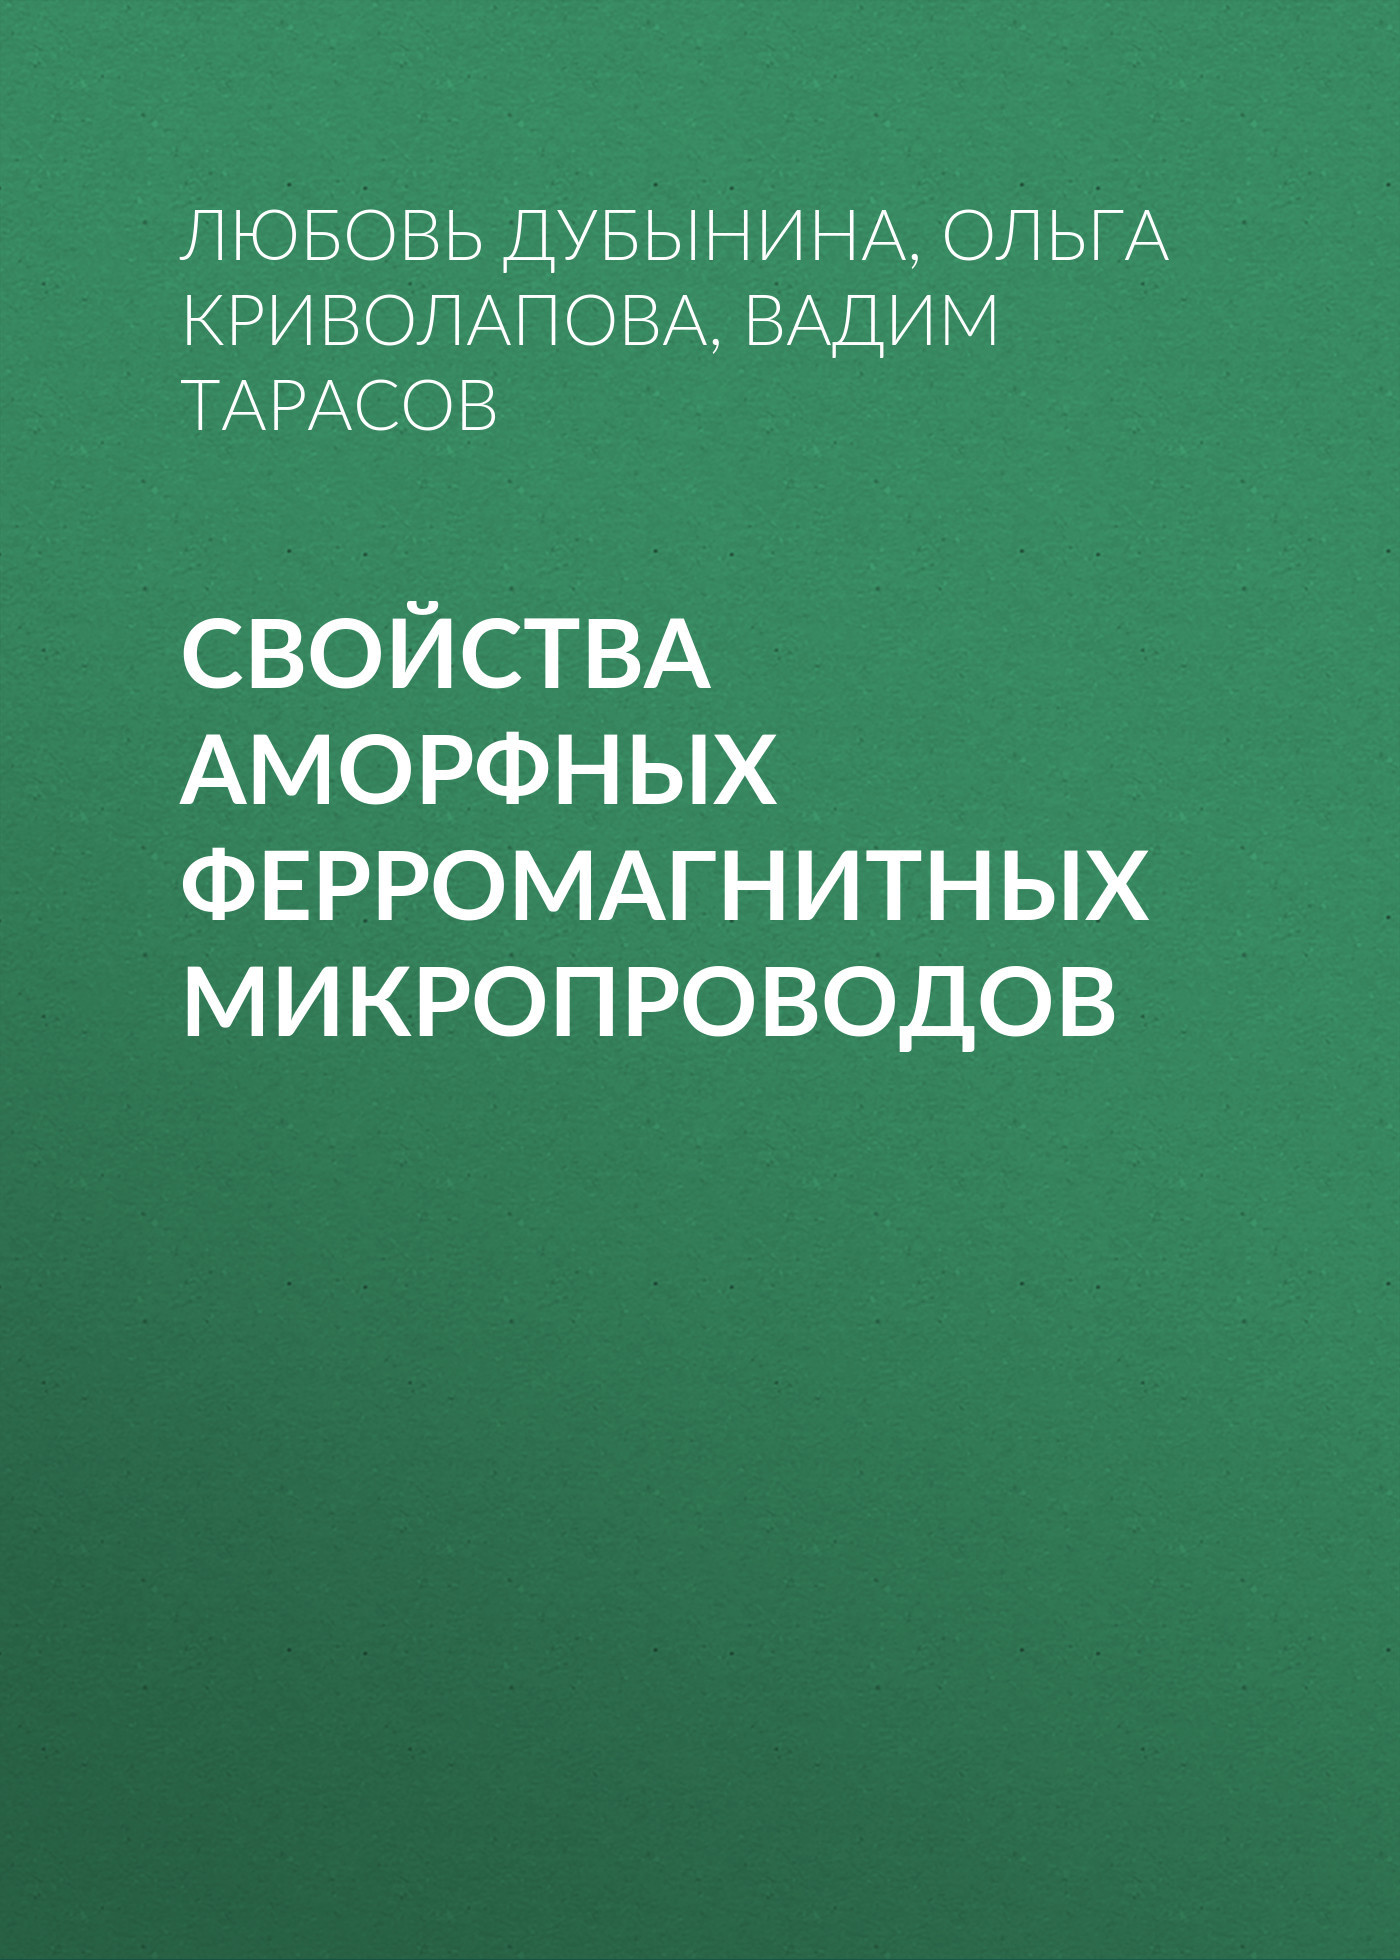 Вадим Тарасов бесплатно